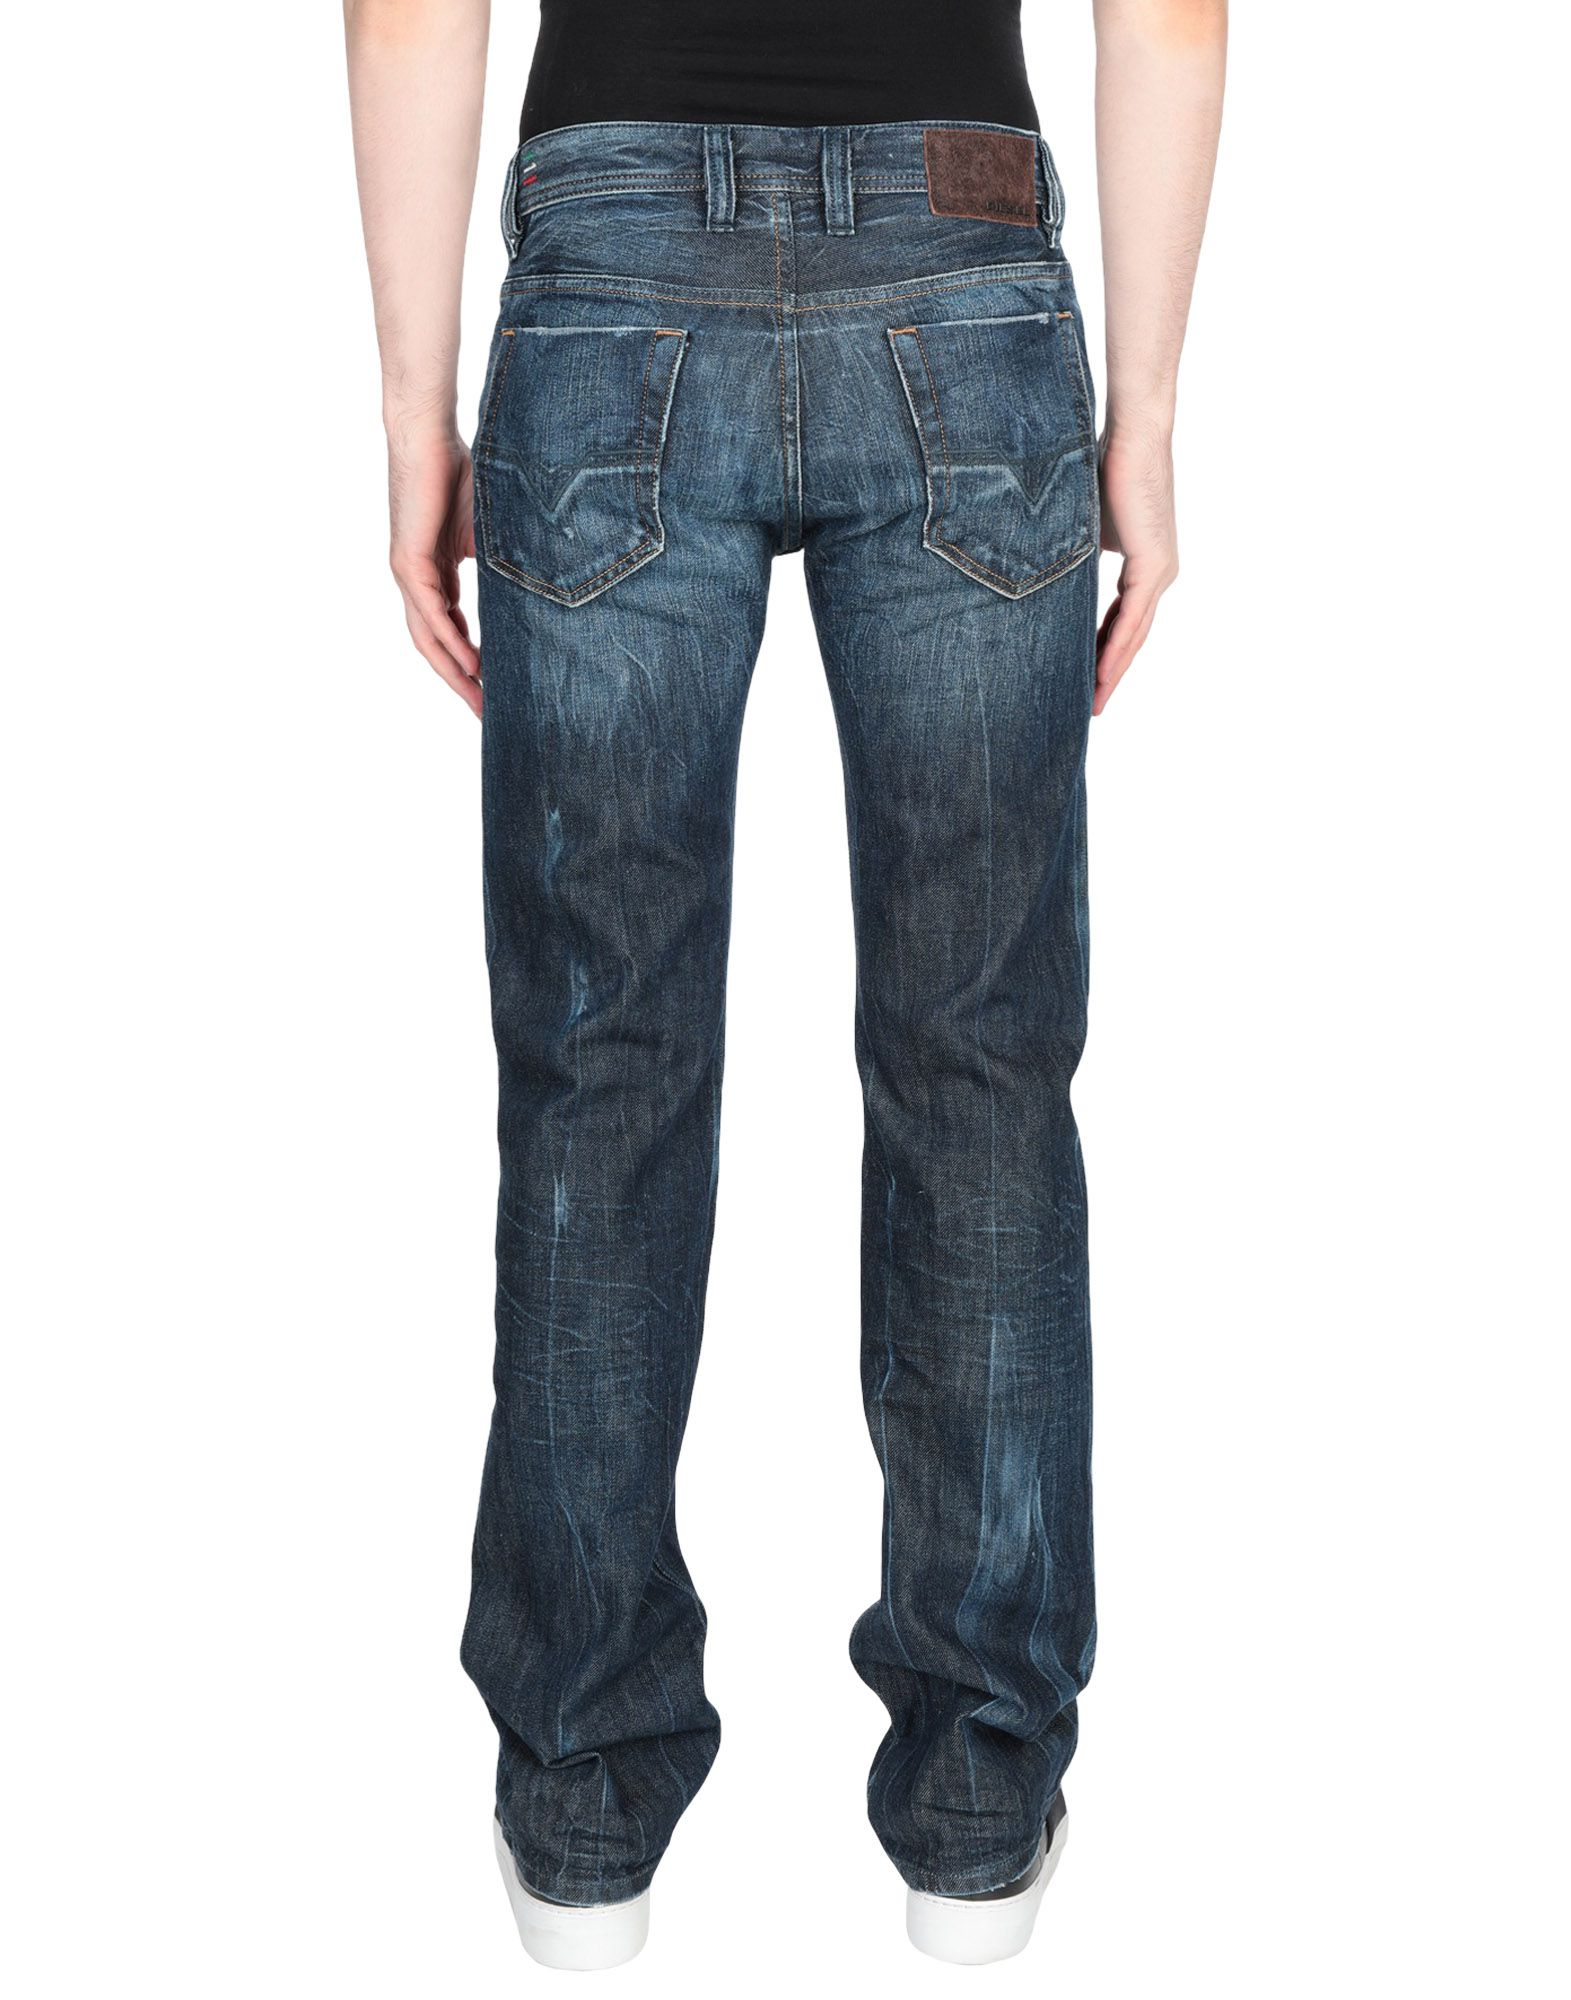 Pantaloni - Jeans Diesel Uomo - Pantaloni 42686522IA 74f37b